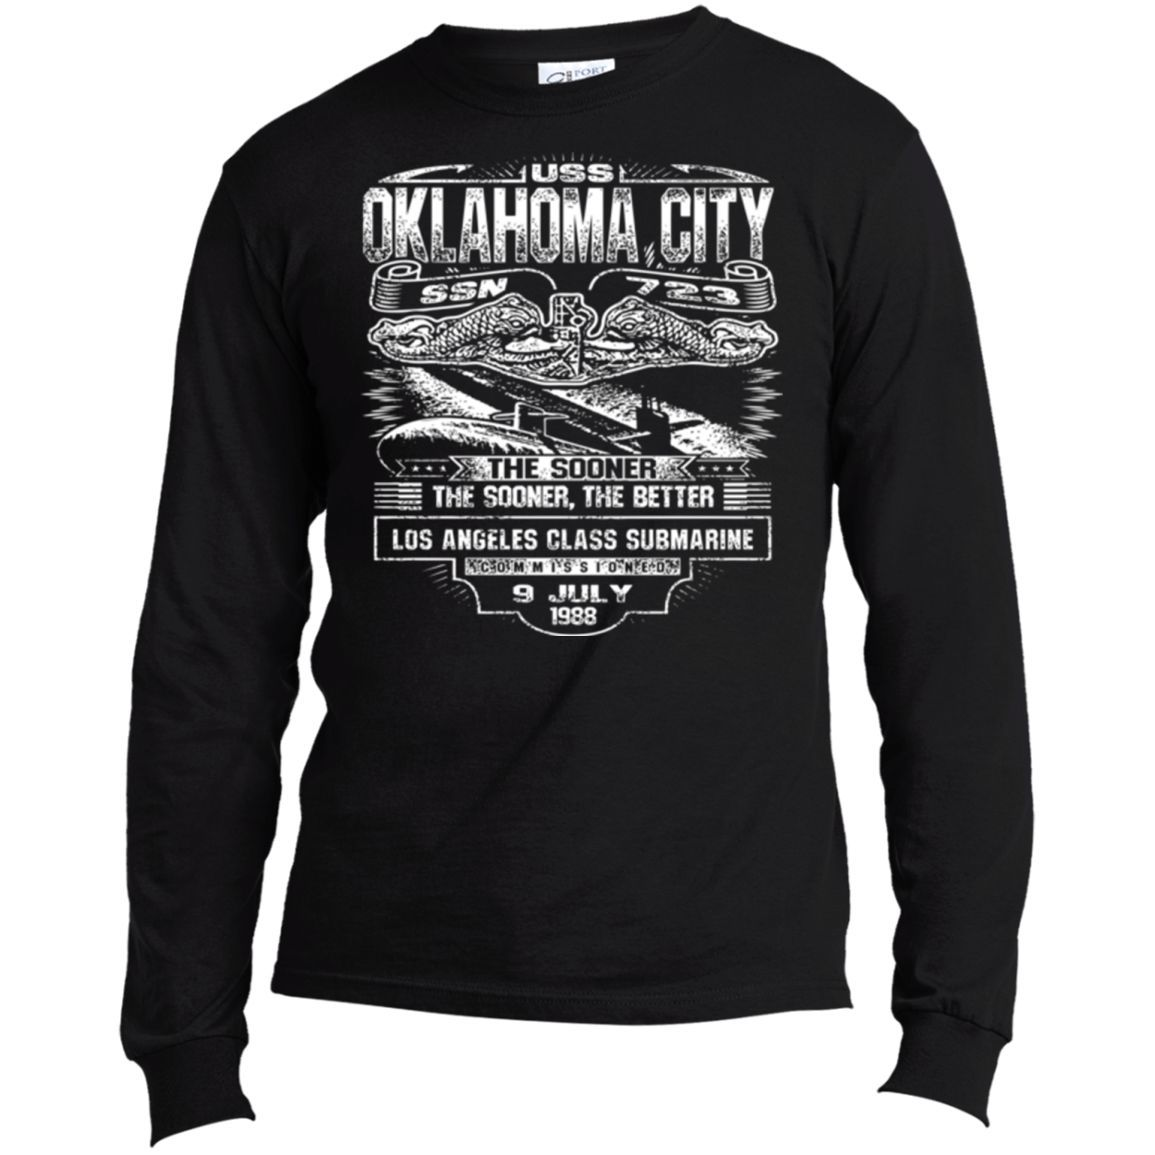 USS OKLAHOMA CITY SSN 723 T Shirts and Hoodies Alabama